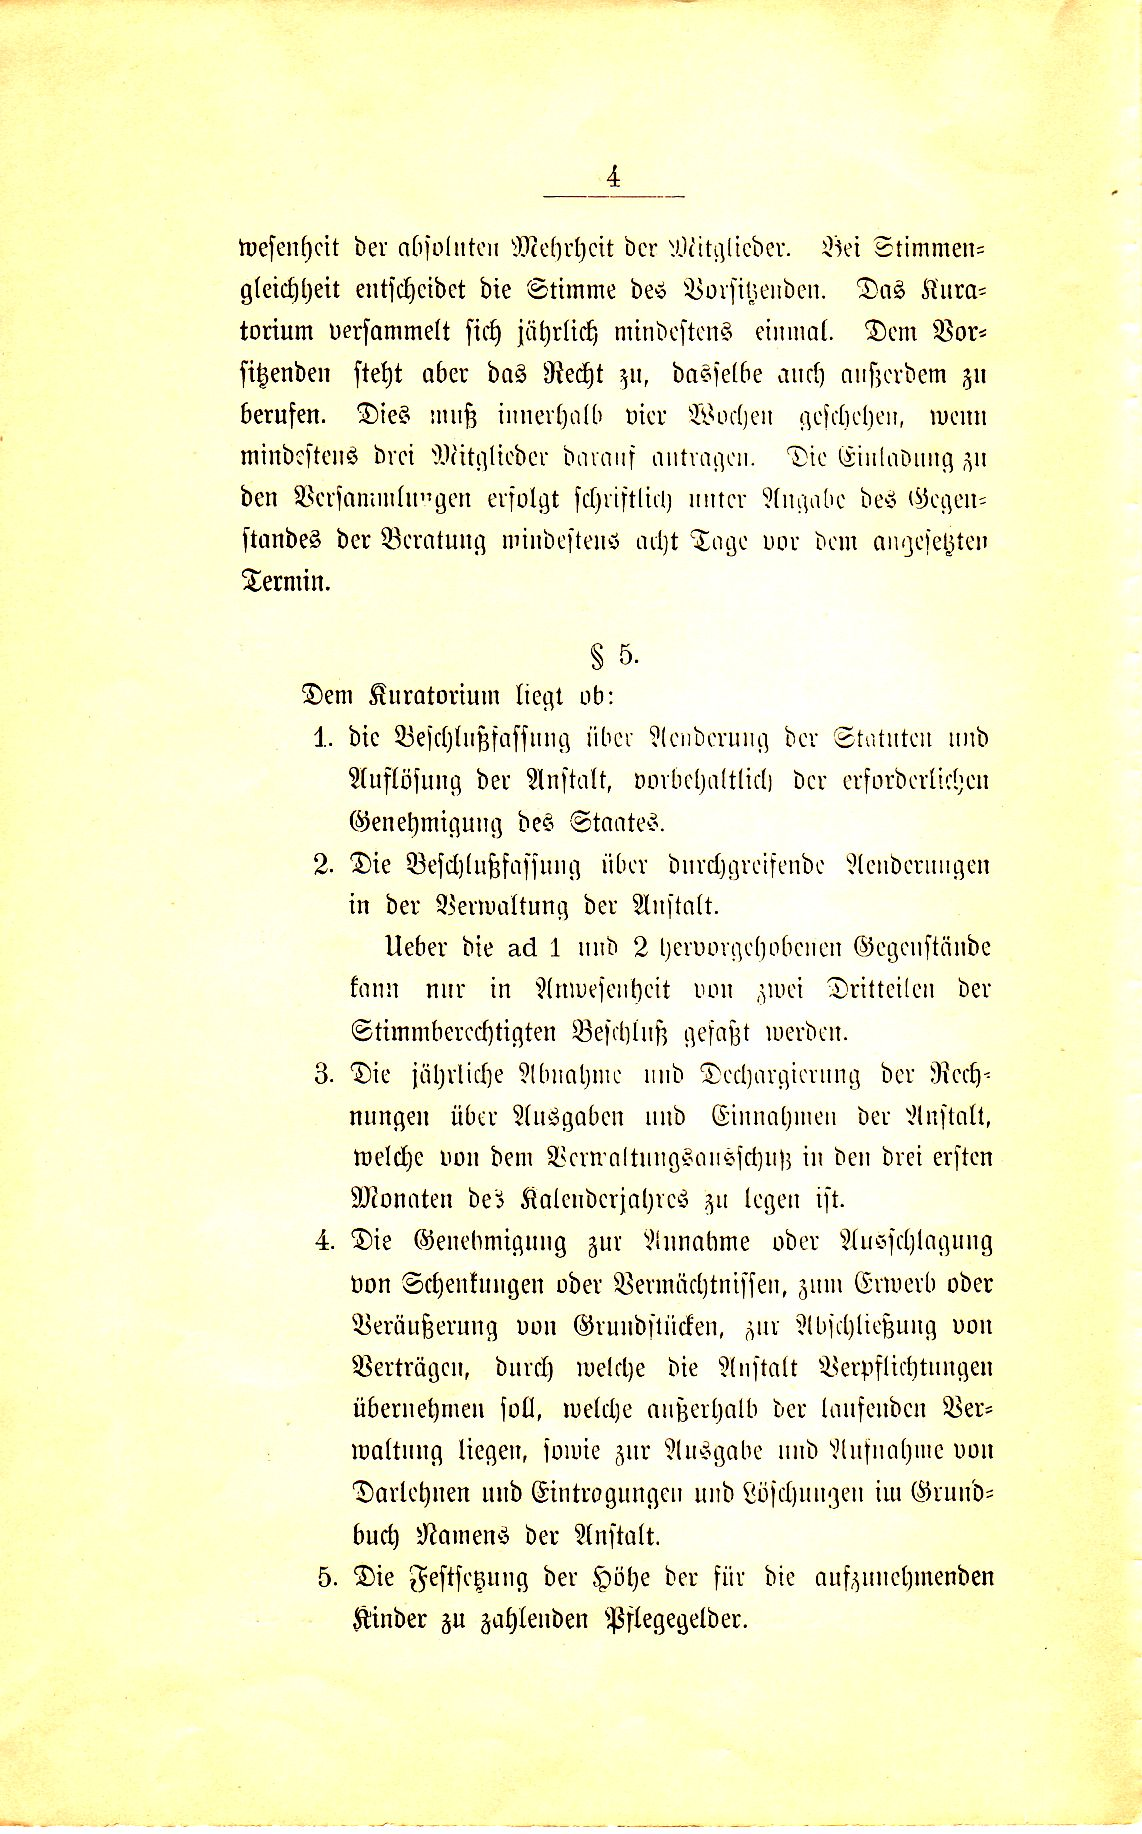 Statut Seite 4